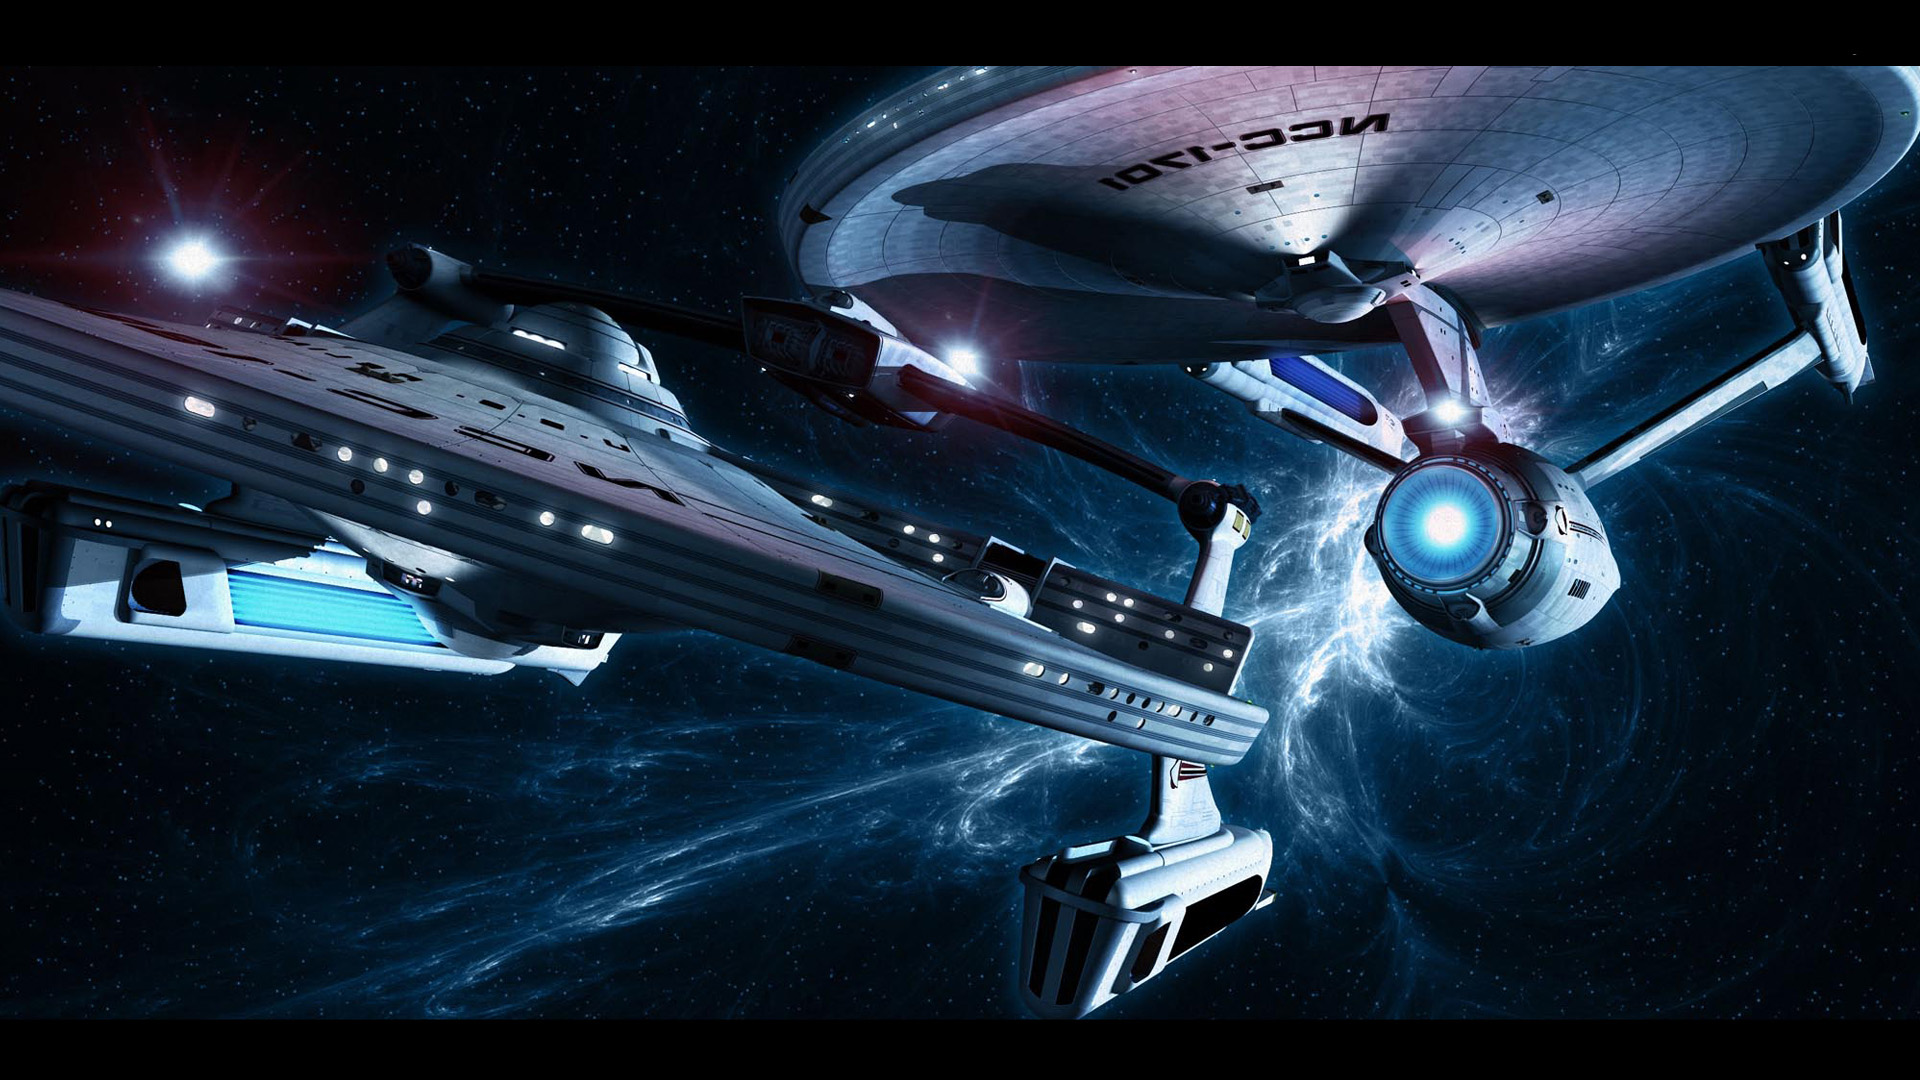 Star Trek Hd Wallpapers